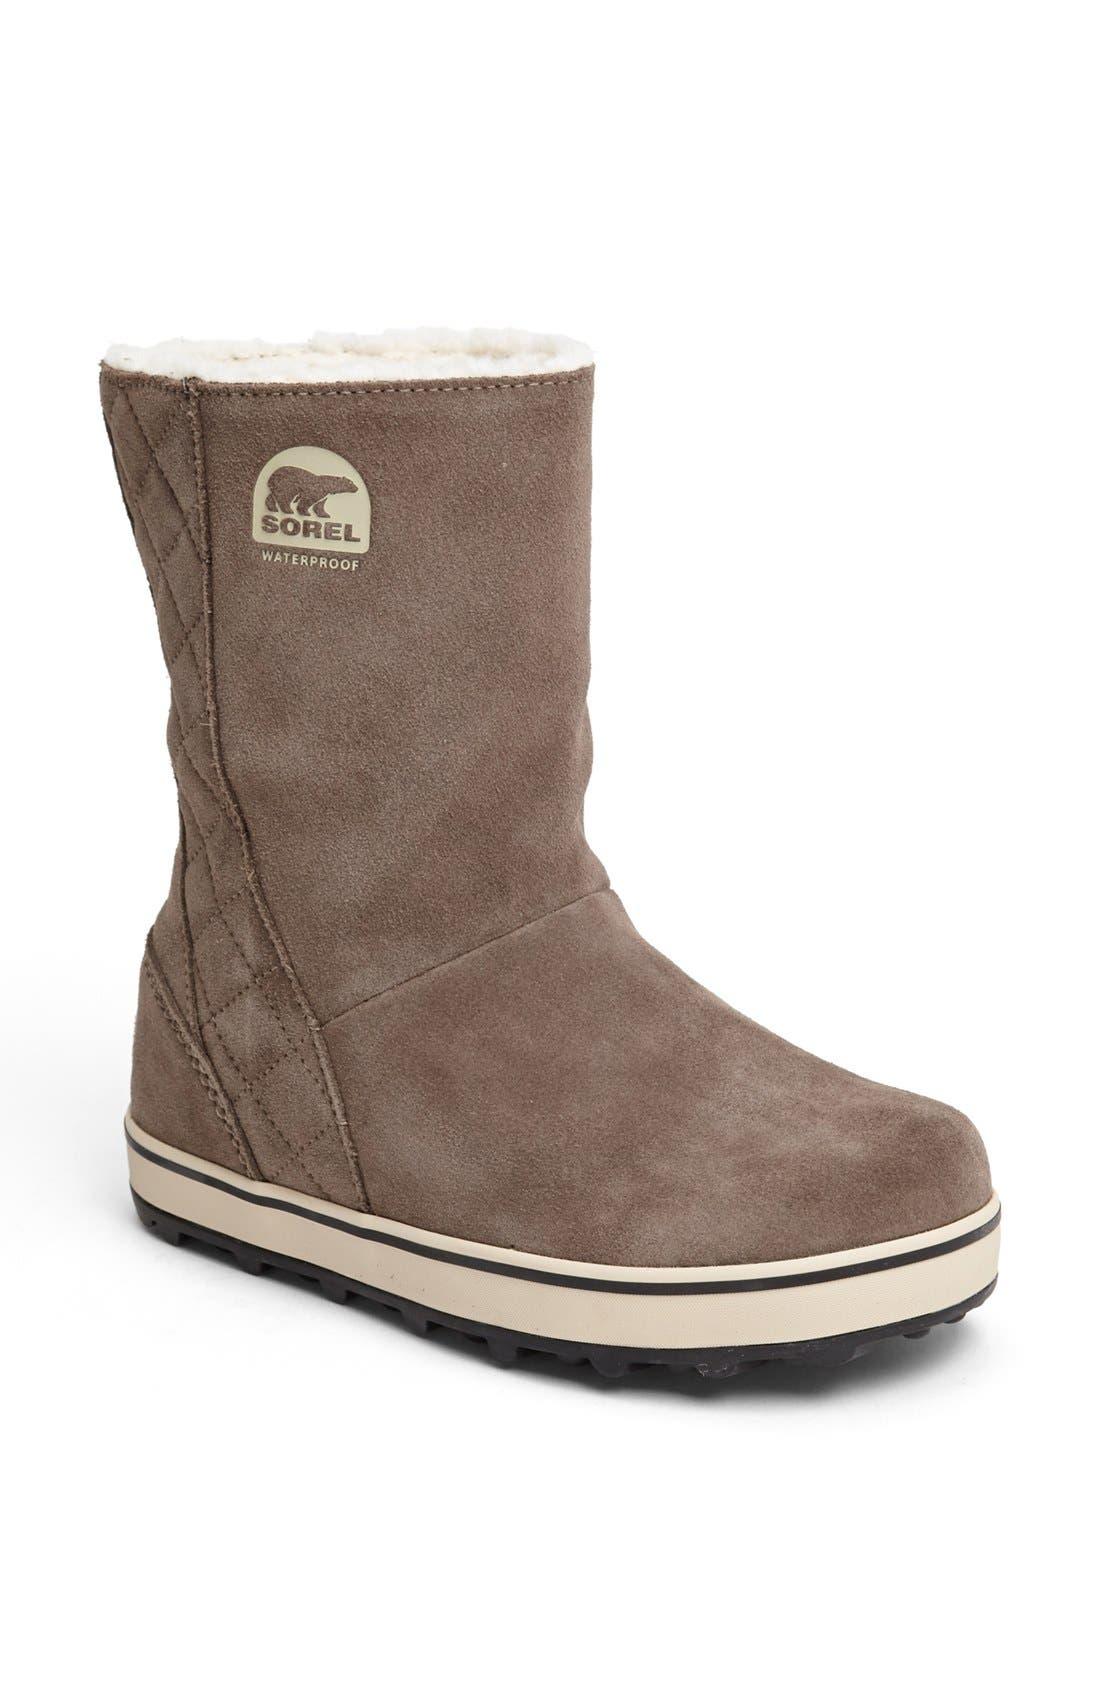 Alternate Image 1 Selected - SOREL 'Glacy™' Waterproof Boot